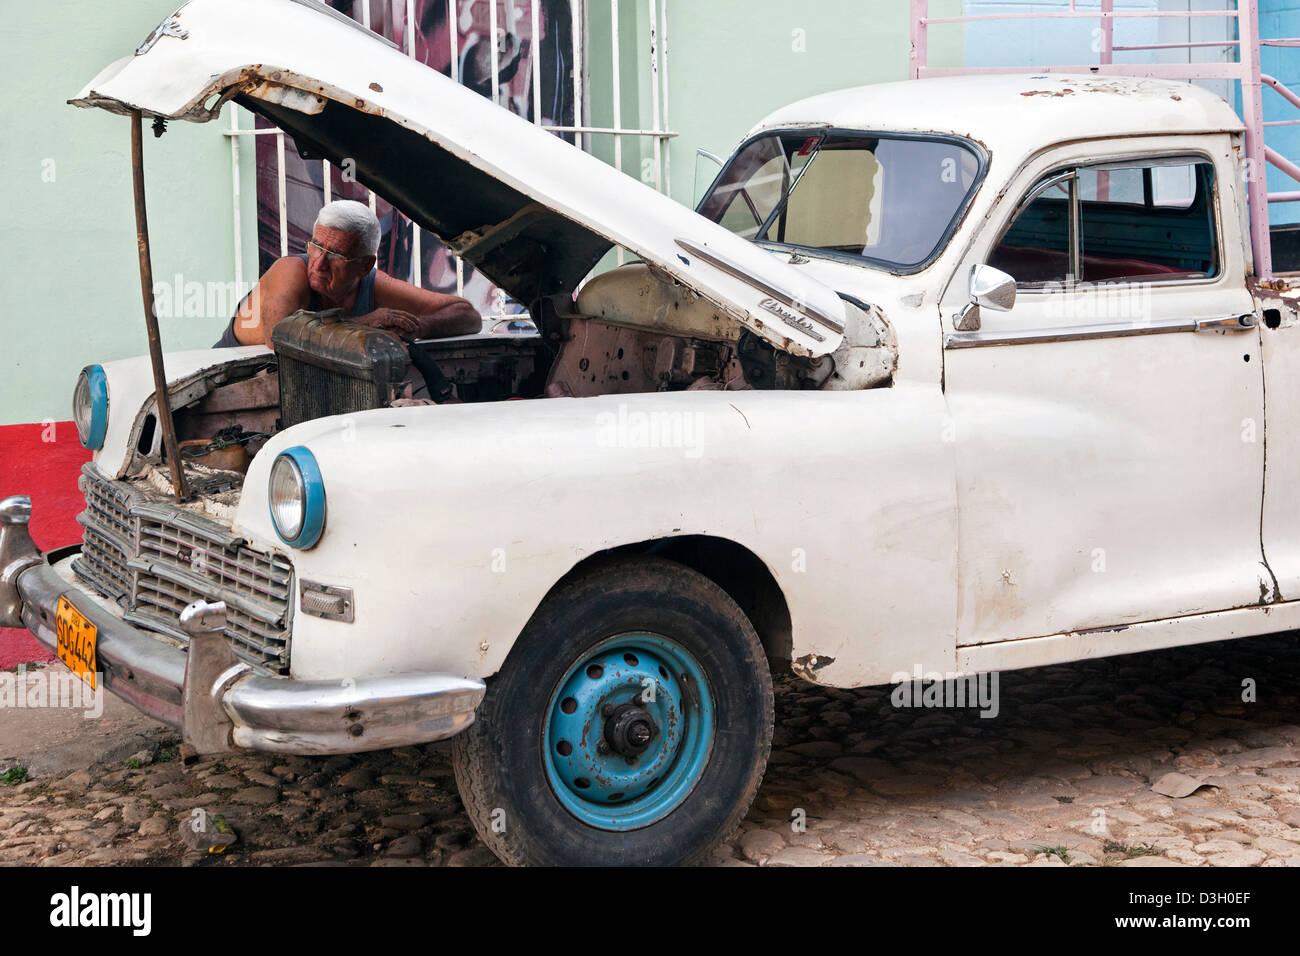 Cuban car mechanic repairing 1950s vintage American Chrysler ...